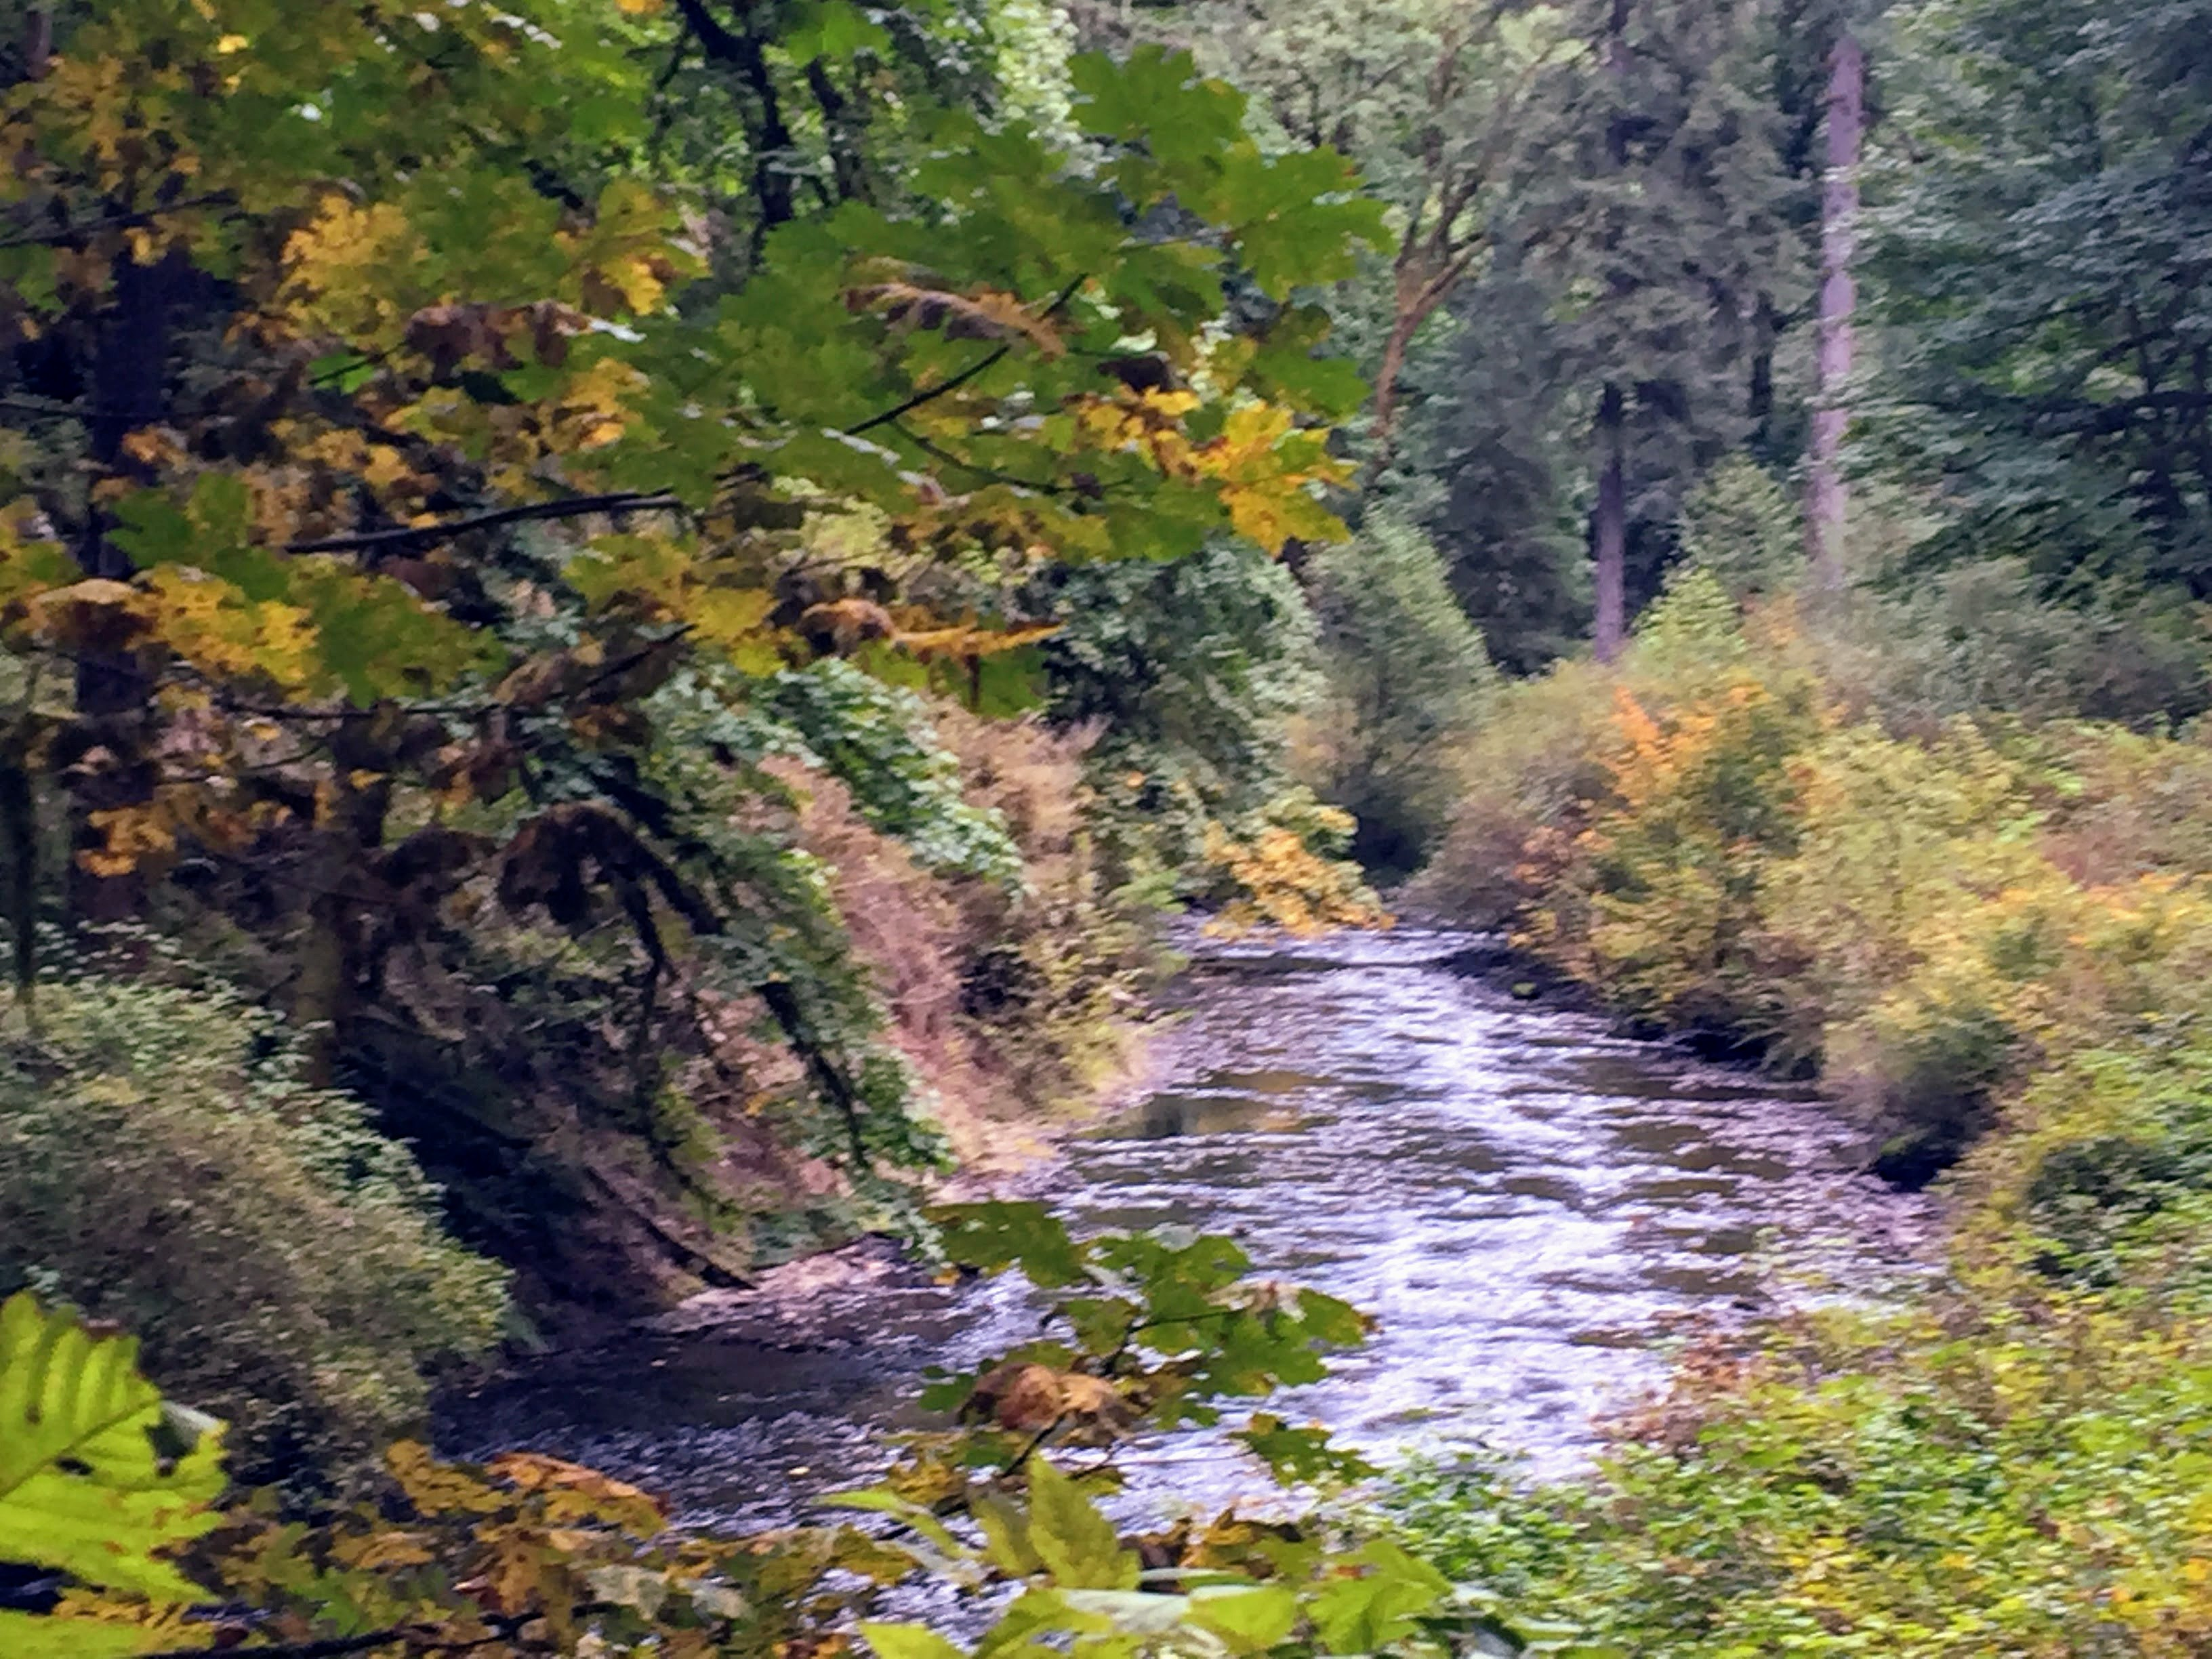 2017-10-01 Oregon 01 Silver Falls 32